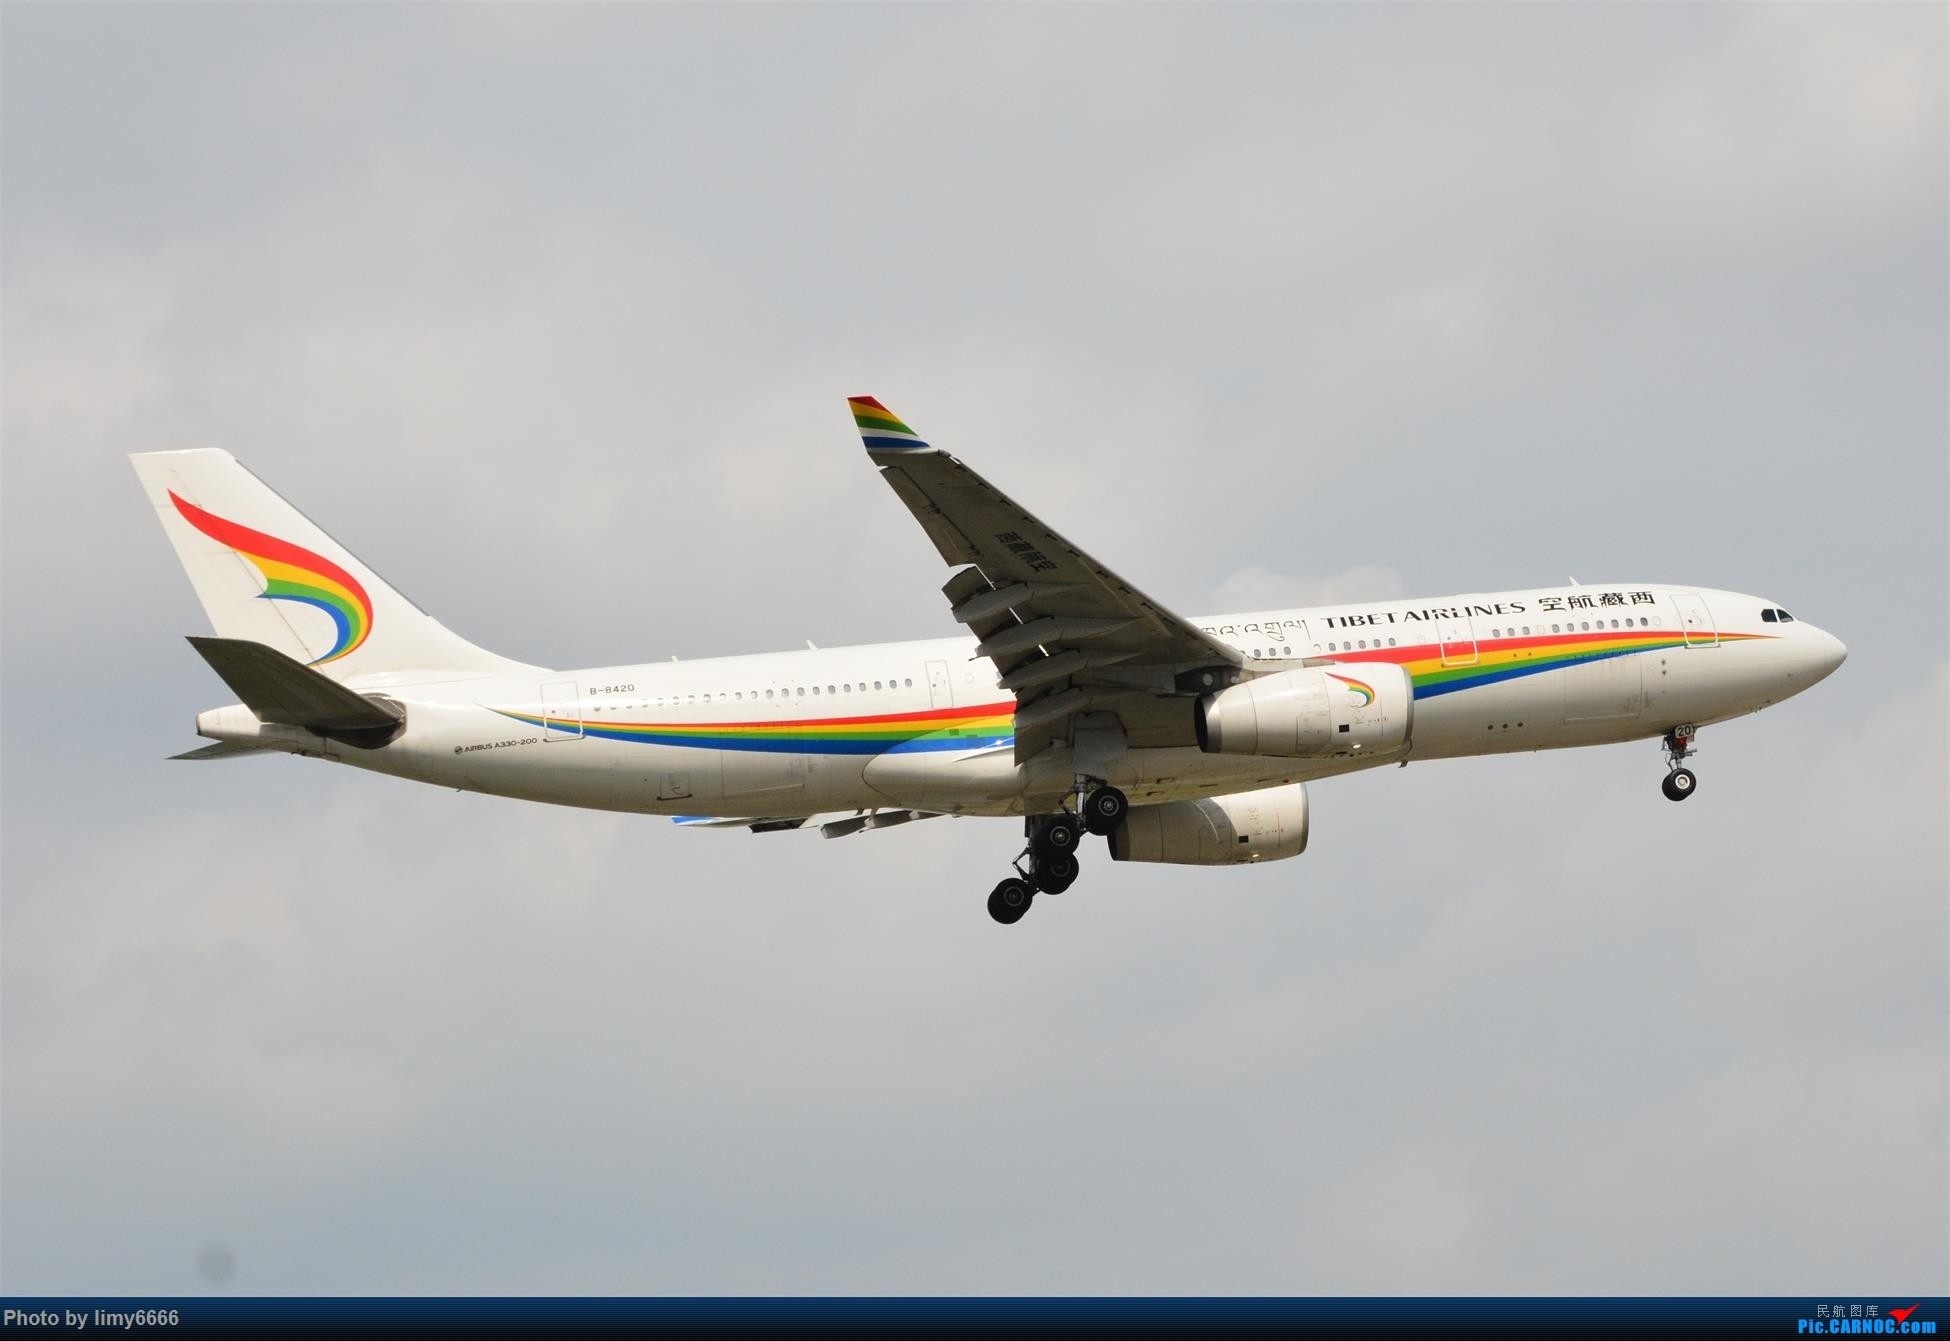 Re:[原创]上海虹桥机场拍机(在贵阳很少见或看不见的) AIRBUS A330-200 B-8420 中国上海虹桥国际机场